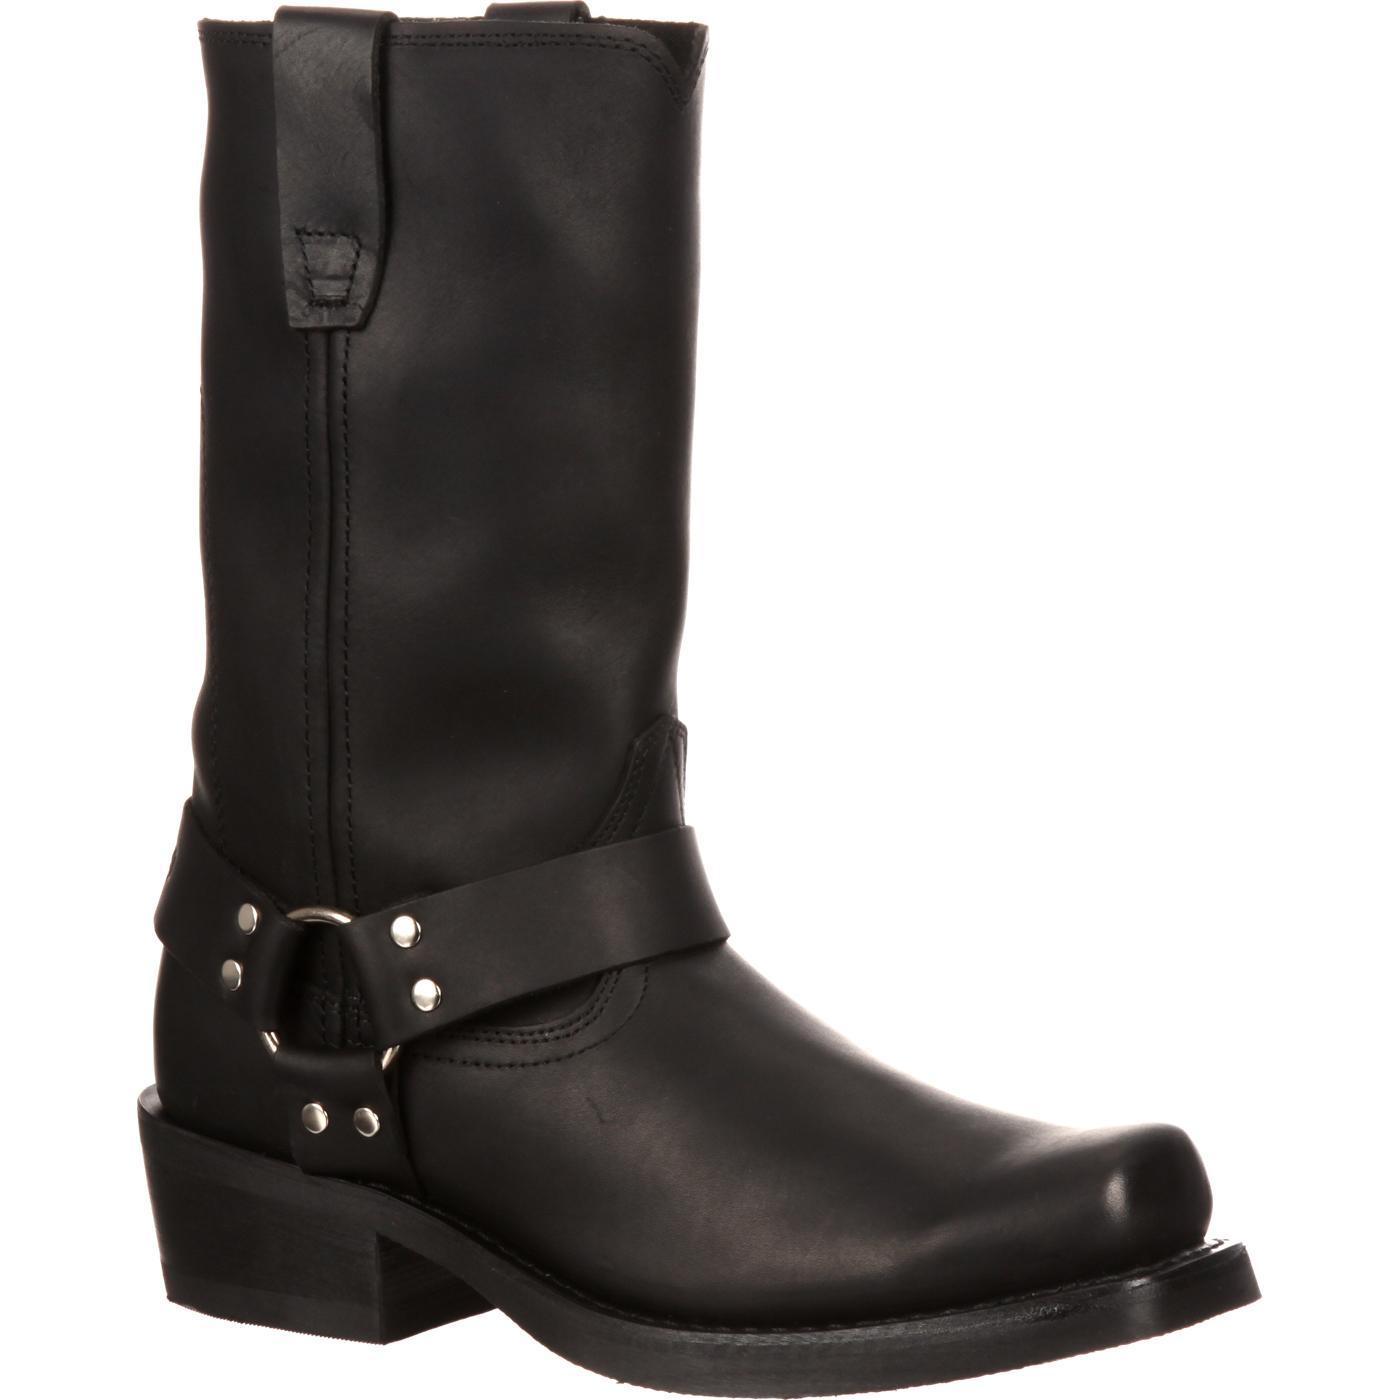 durango s 11 inch black harness boots style db510